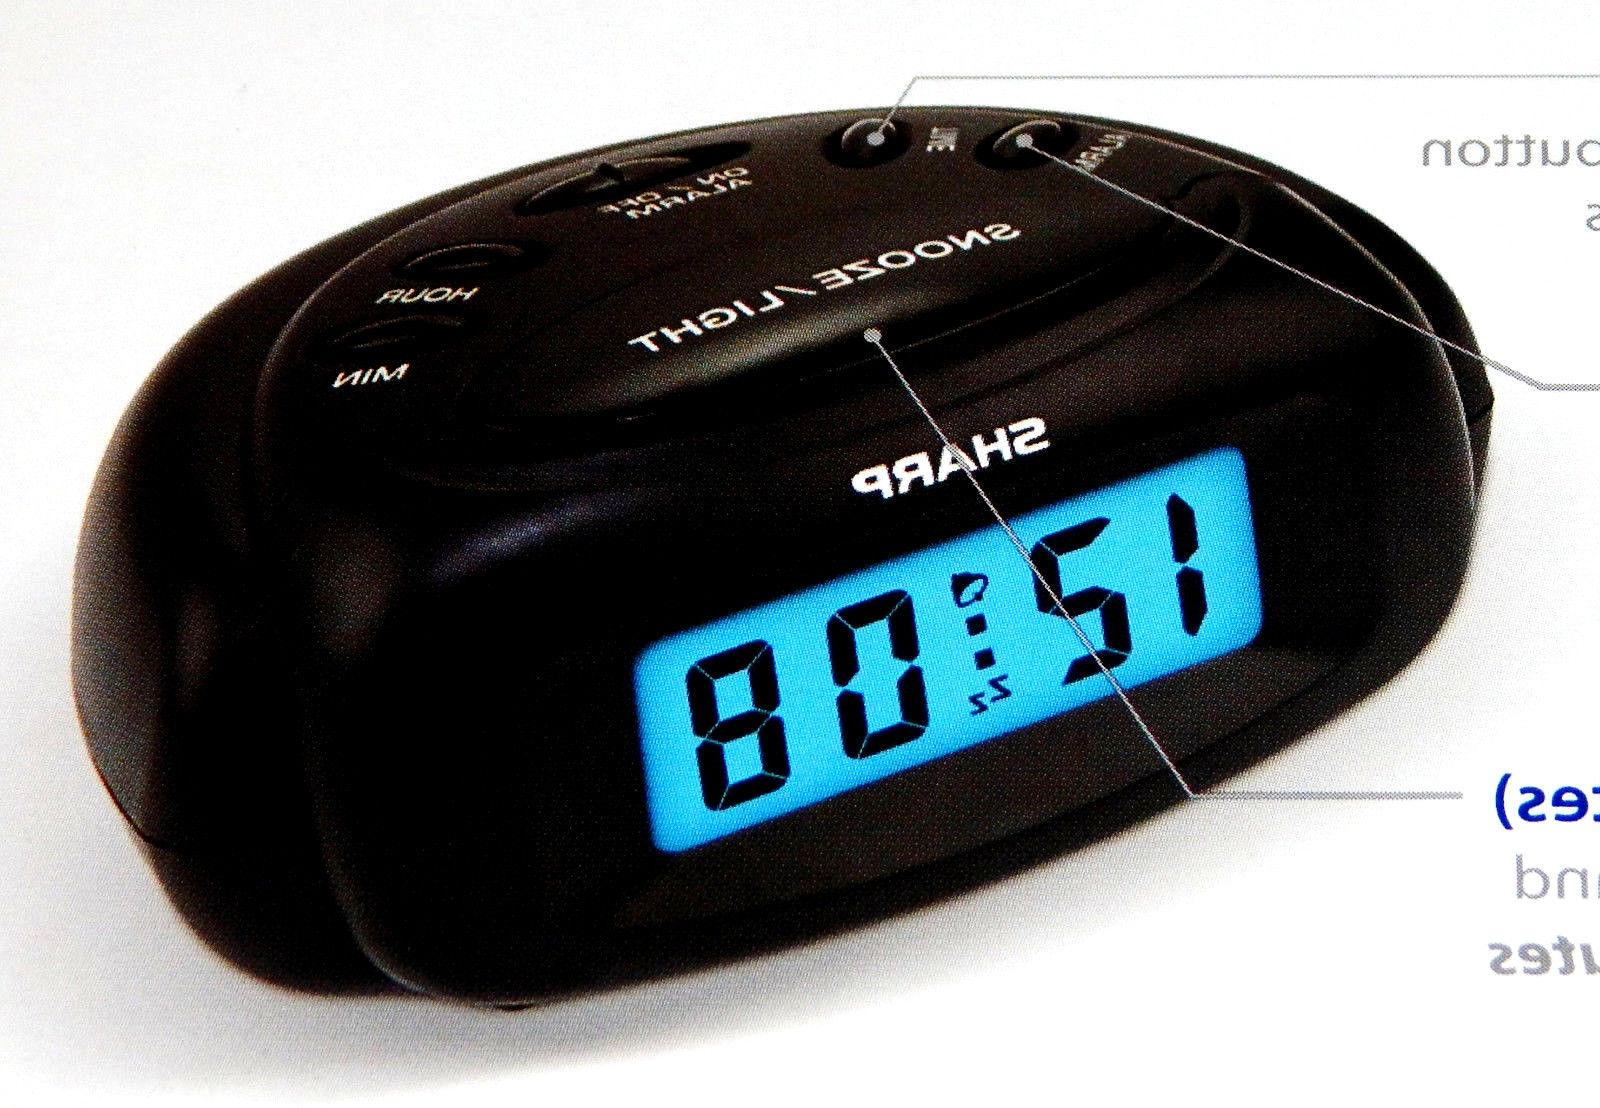 Sharp SPC500A Mini Digital Alarm Clock Battery Power Backlig